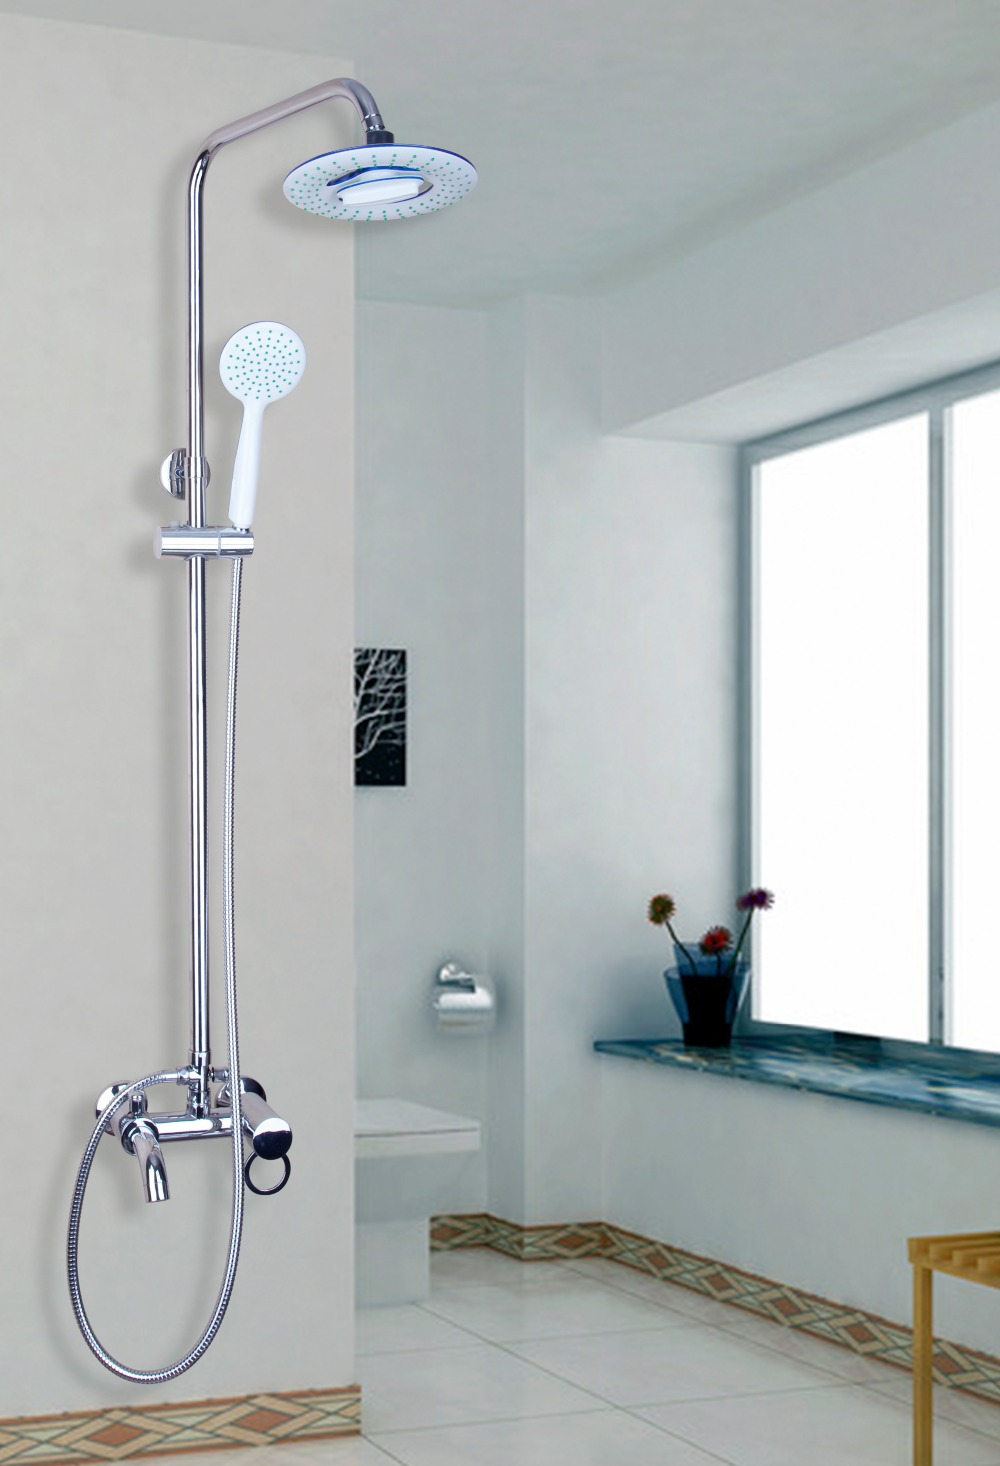 Buy bathtub spray hose and get free shipping on AliExpress.com